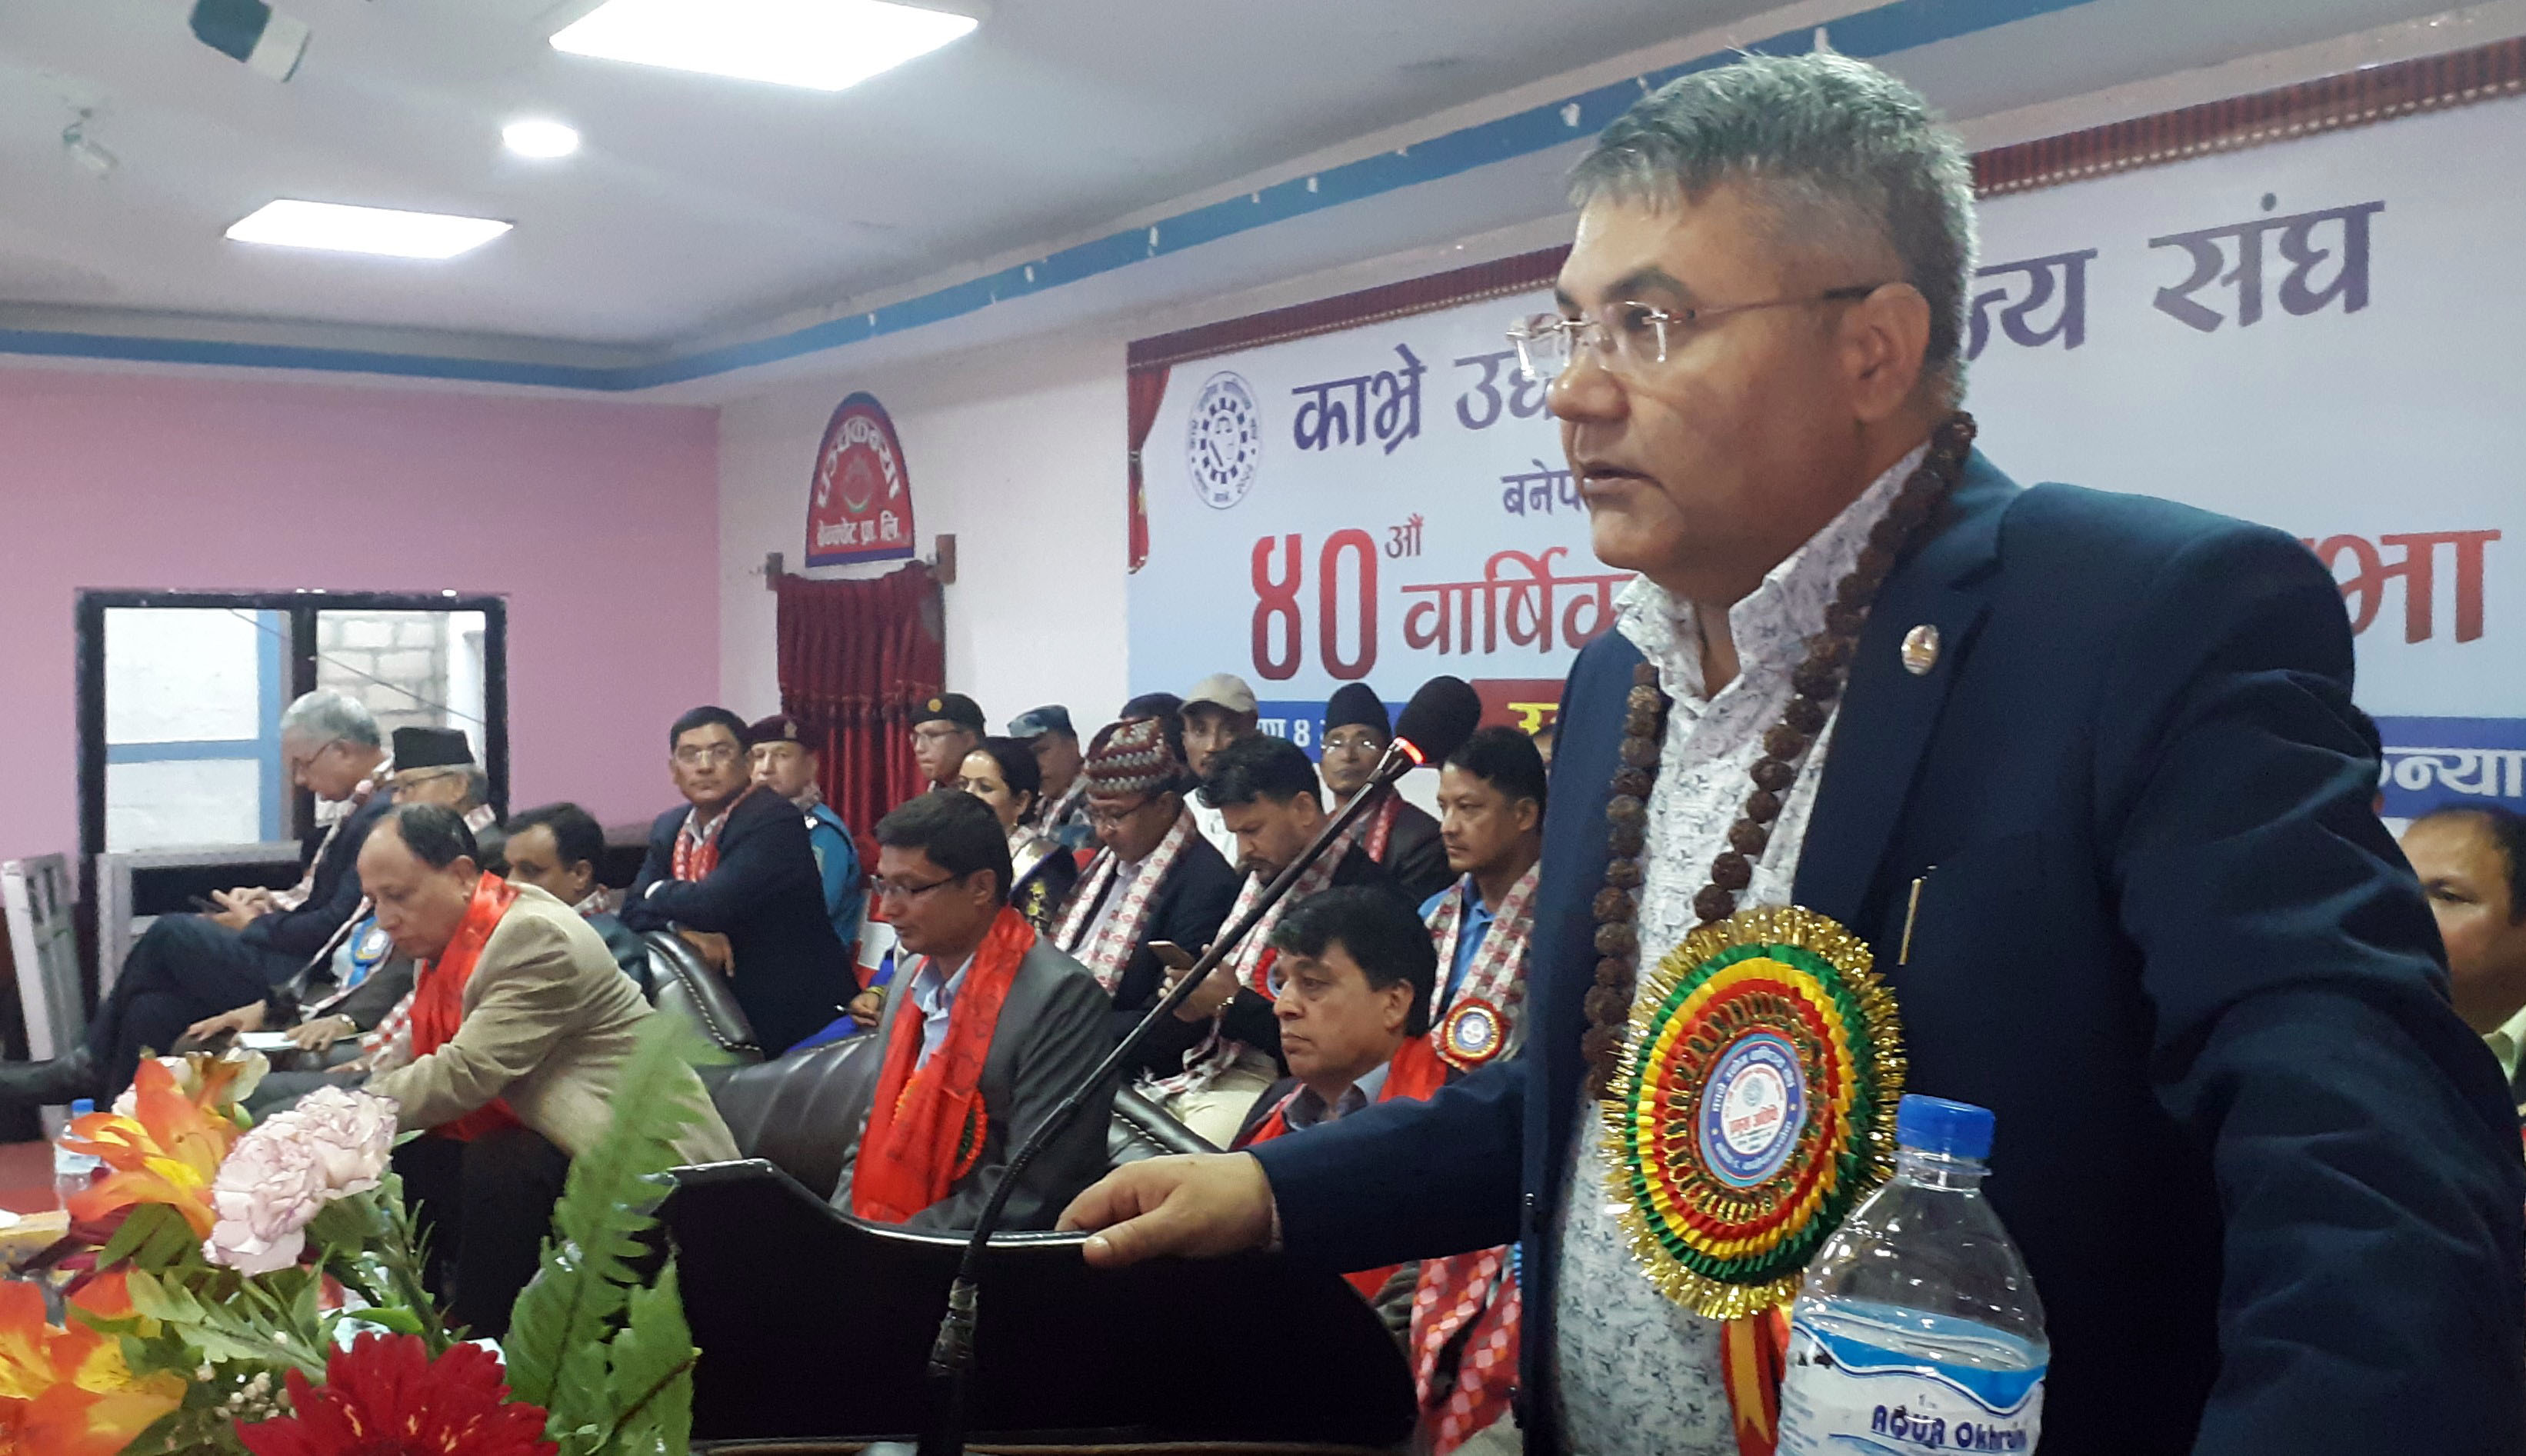 Violence unacceptable in Buddha's land: Minister Banskota